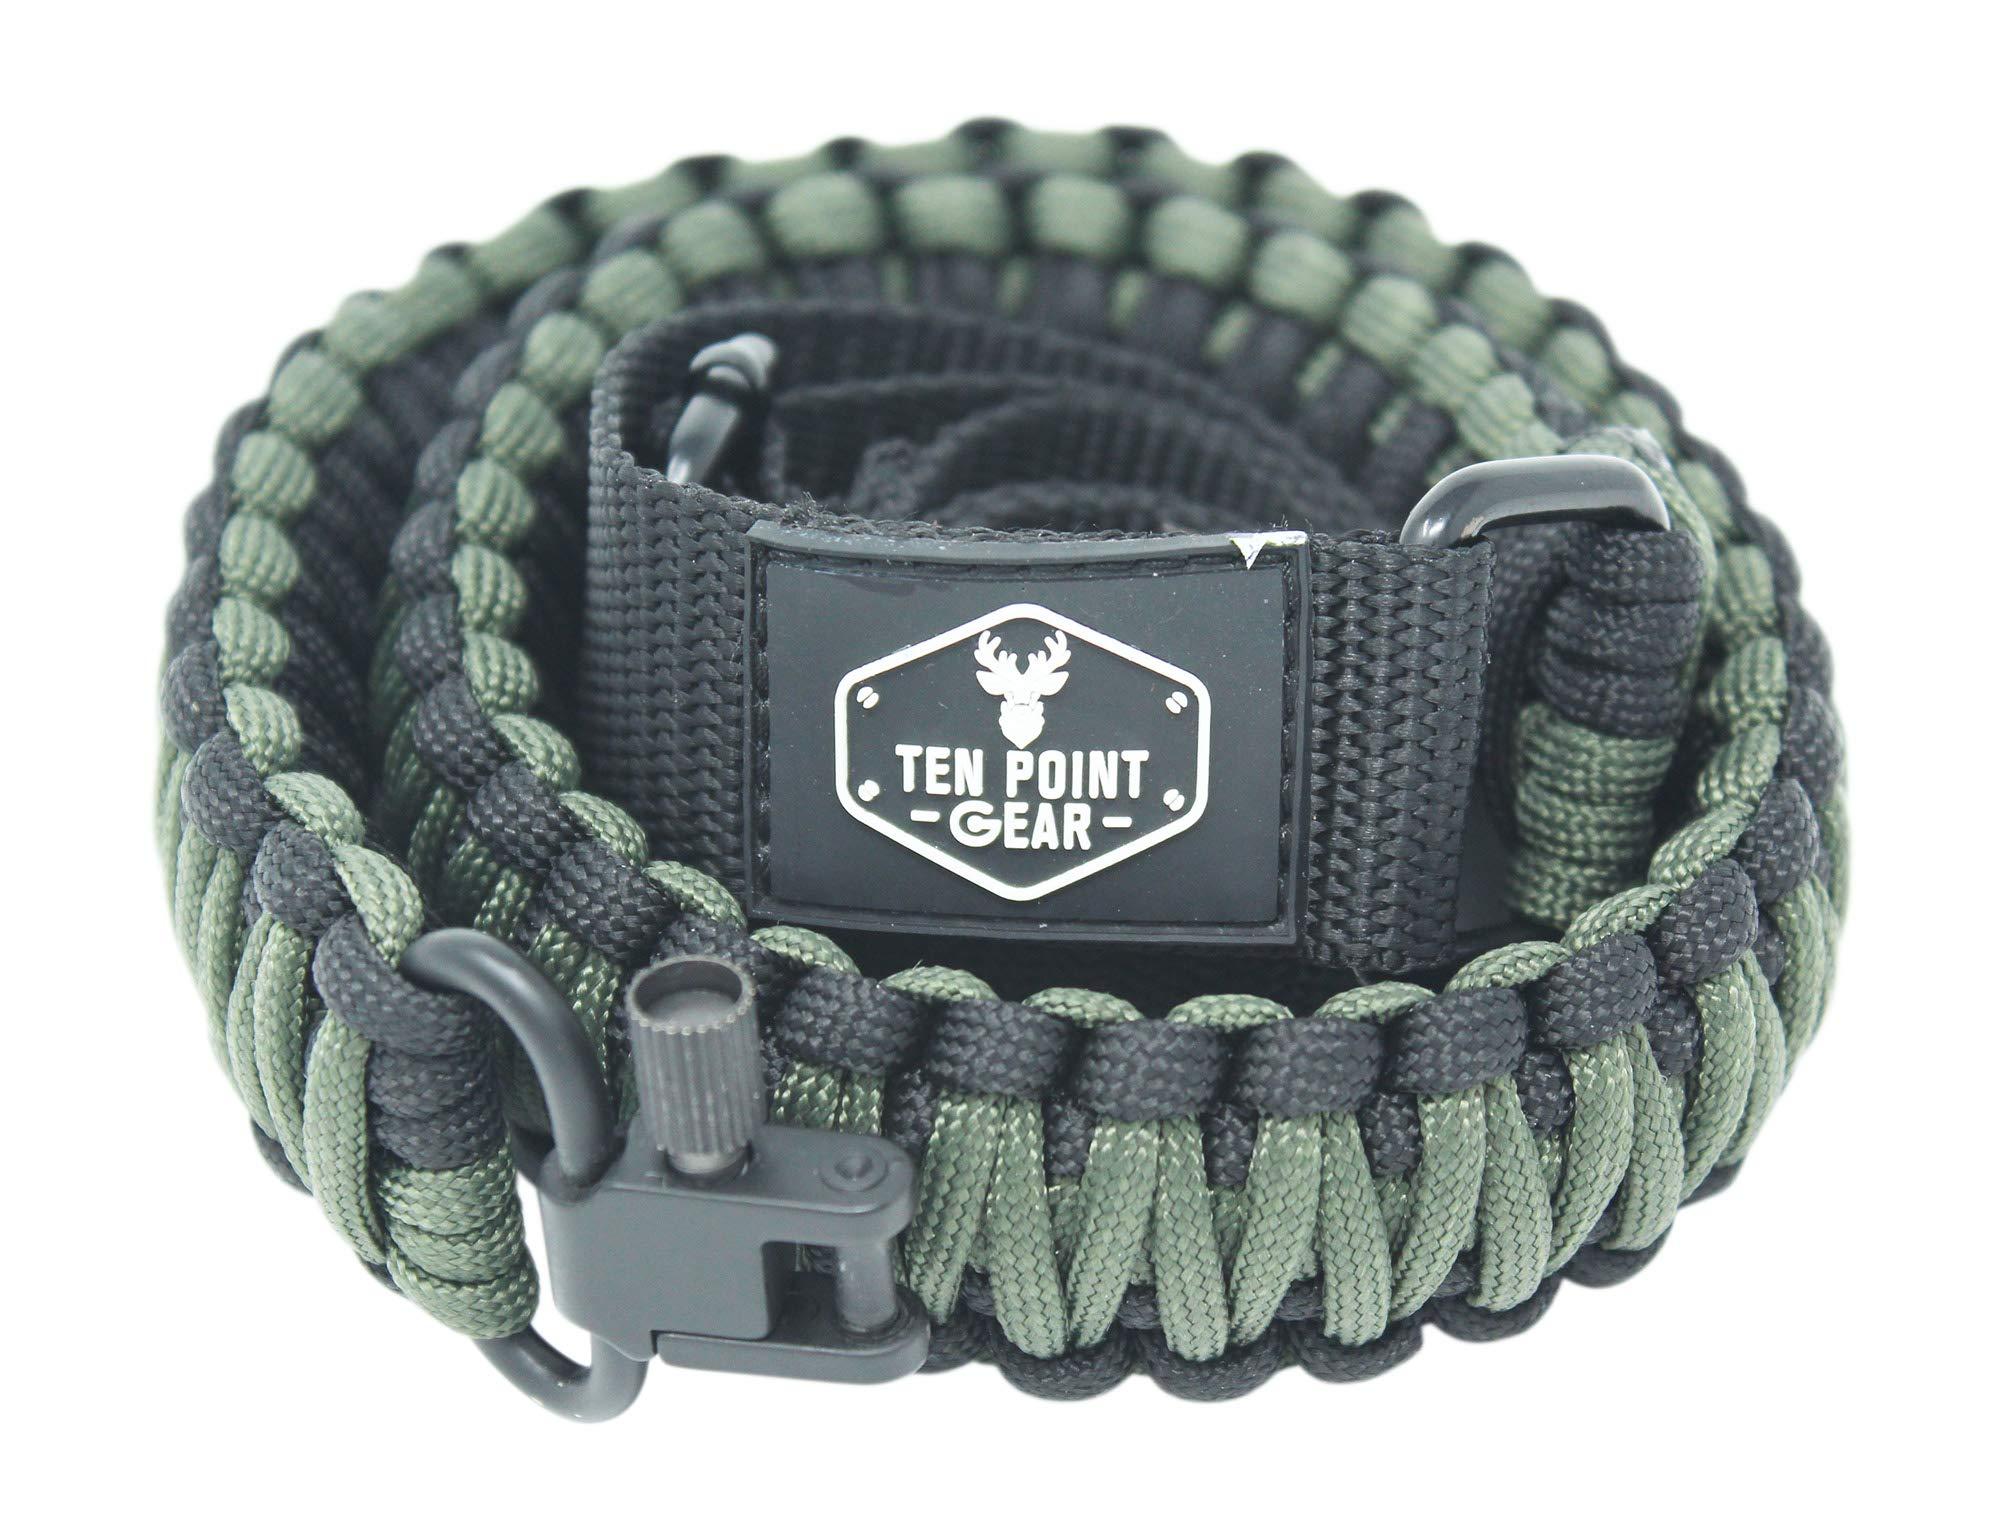 Ten Point Gear Gun Sling Paracord 550 Adjustable w/Swivels (Multiple Color Options) (Black & OD - Olive Drab Green) by Ten Point Gear